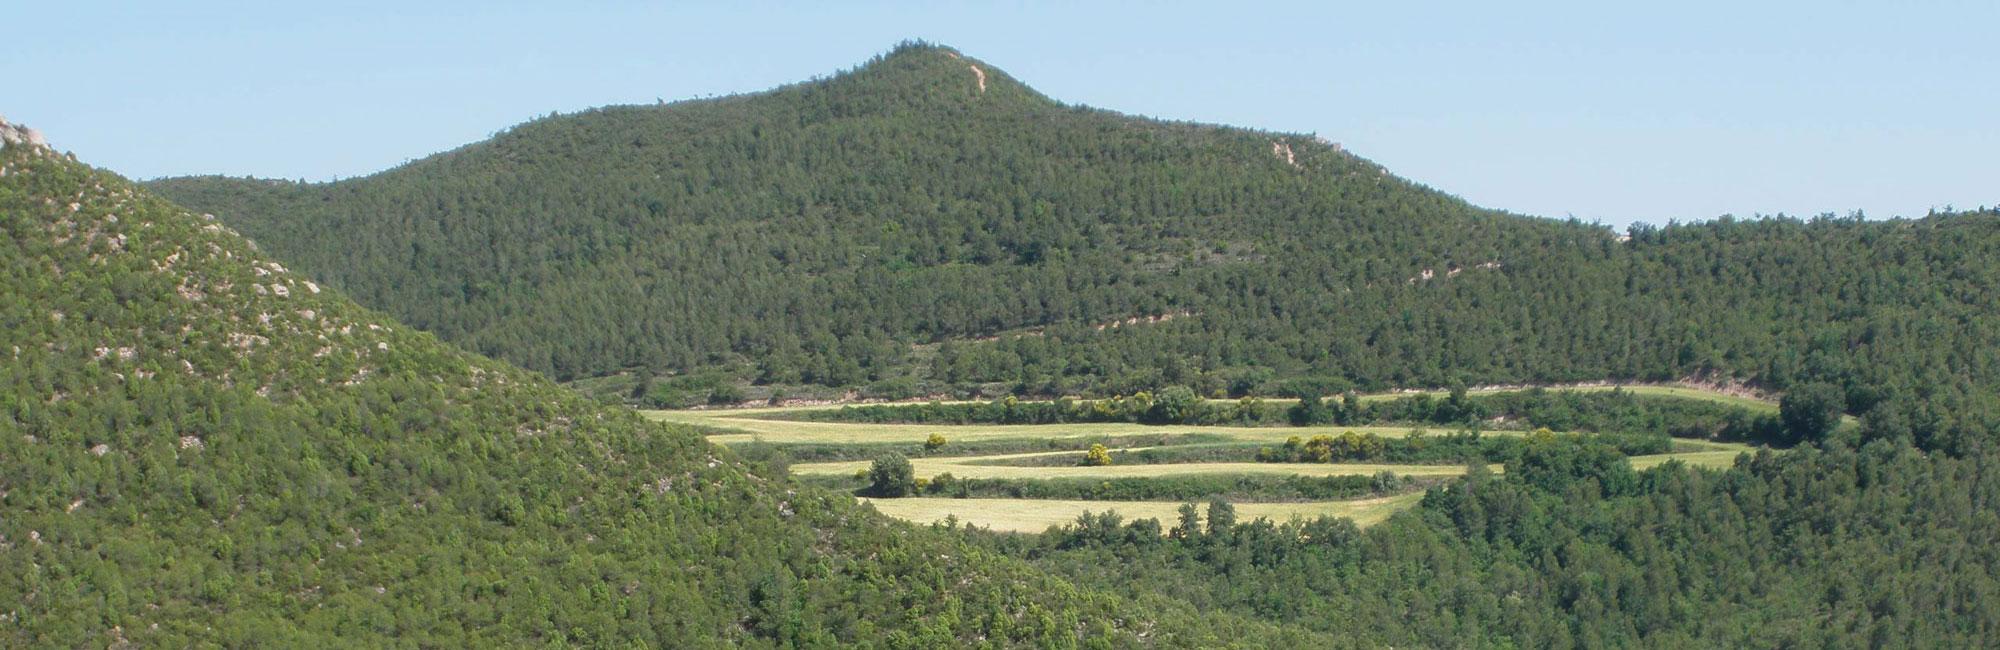 Rubió – Castelltallat – Pinòs